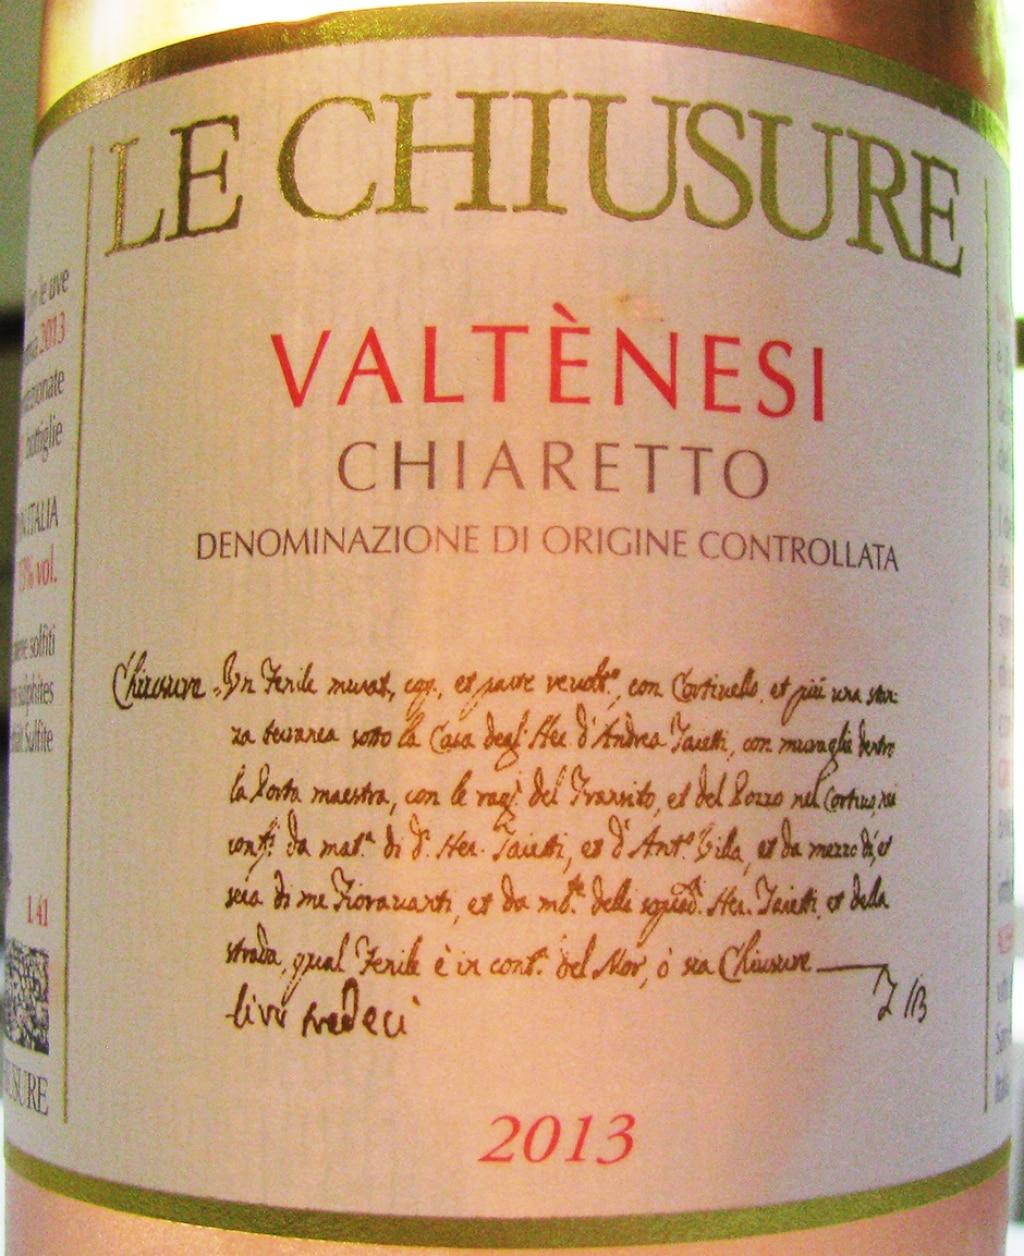 DOC Chiaretto Valtènesi - Le Chiusure 2013